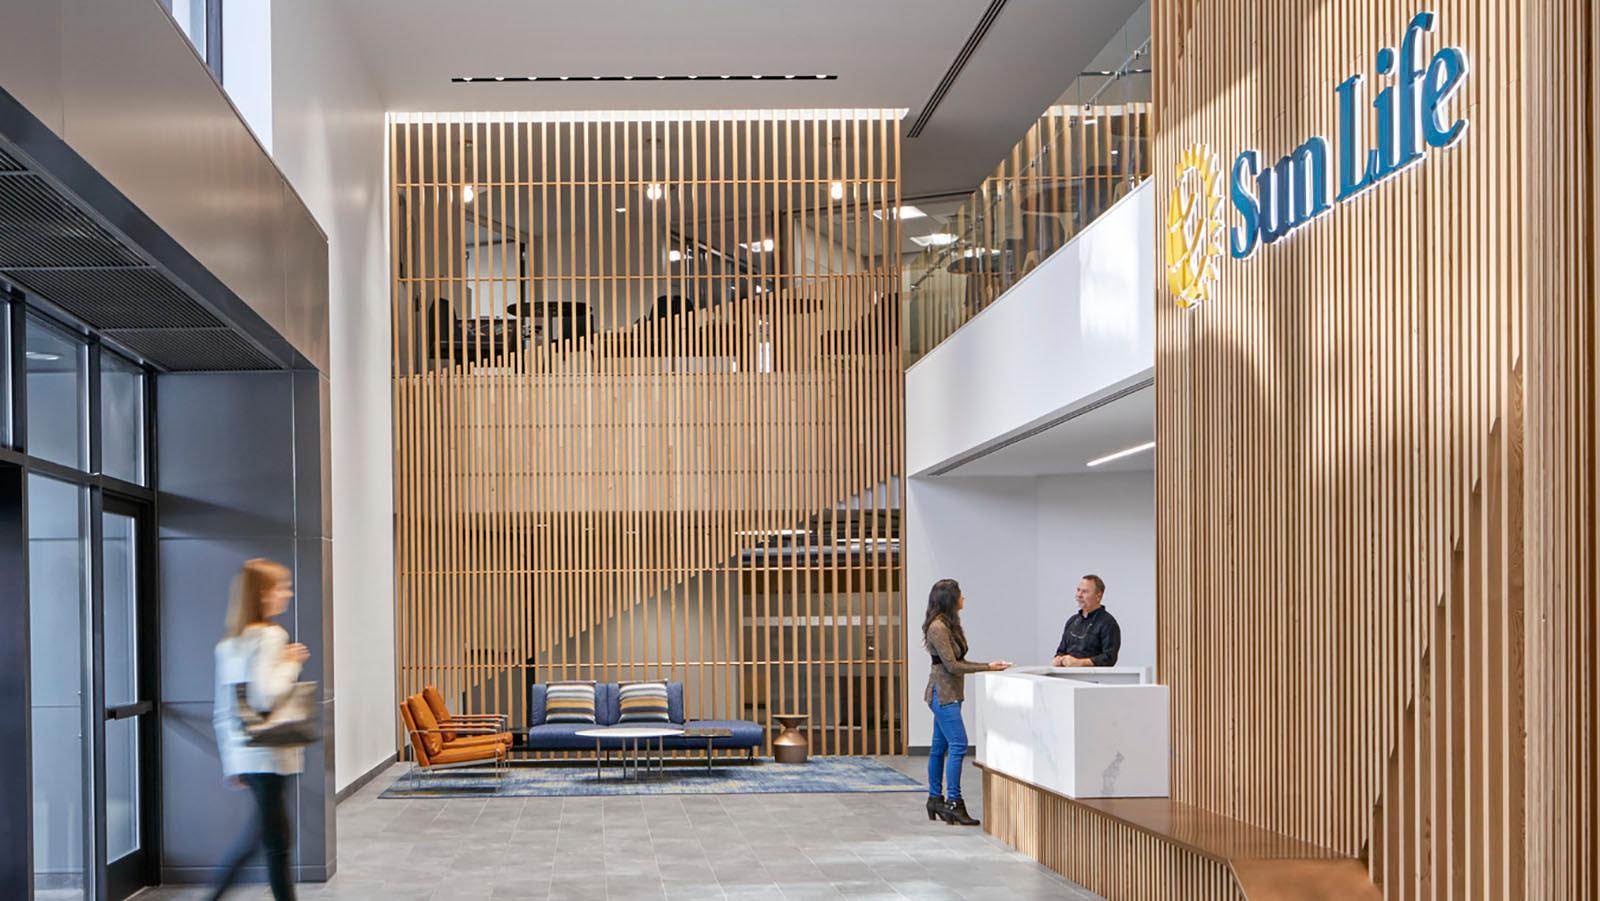 Sun Life Financial Reception area